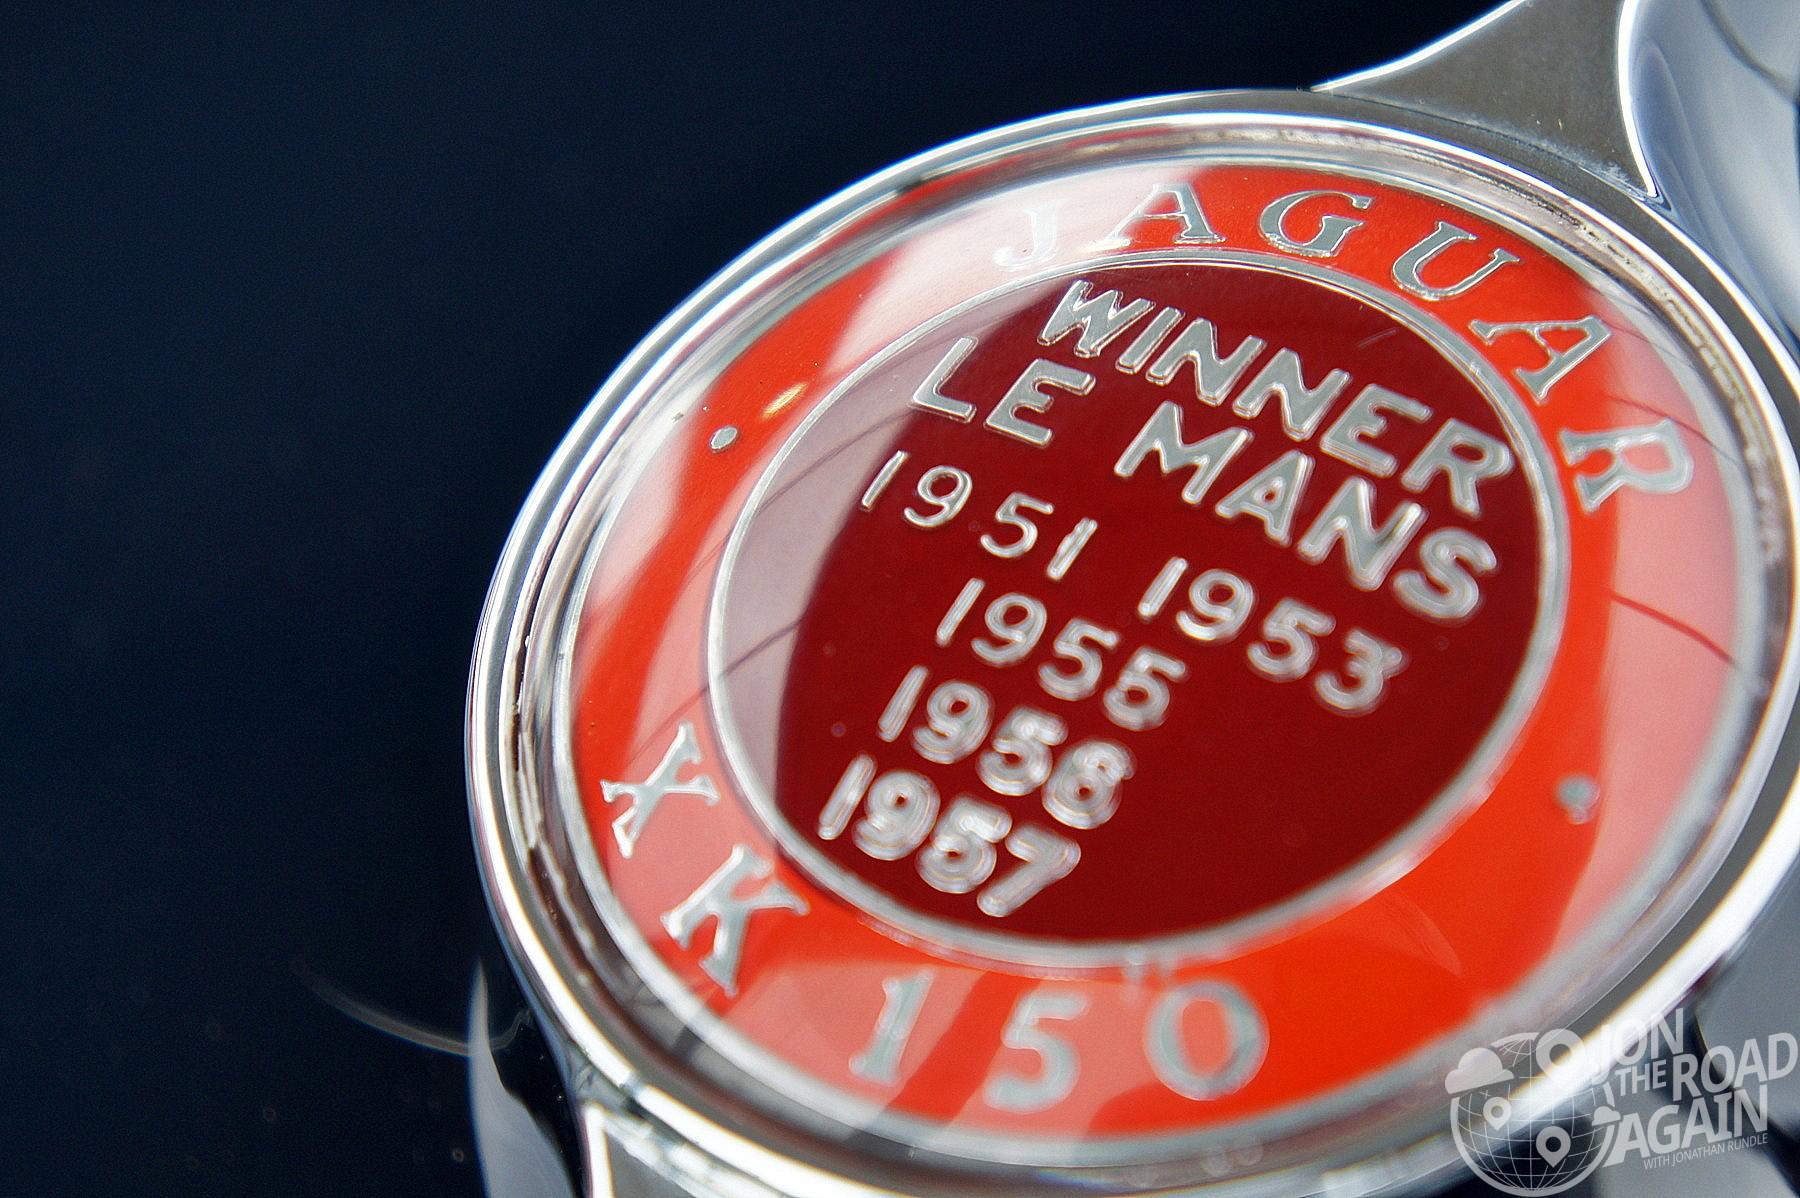 Jaguar Le Mans Winner Badge